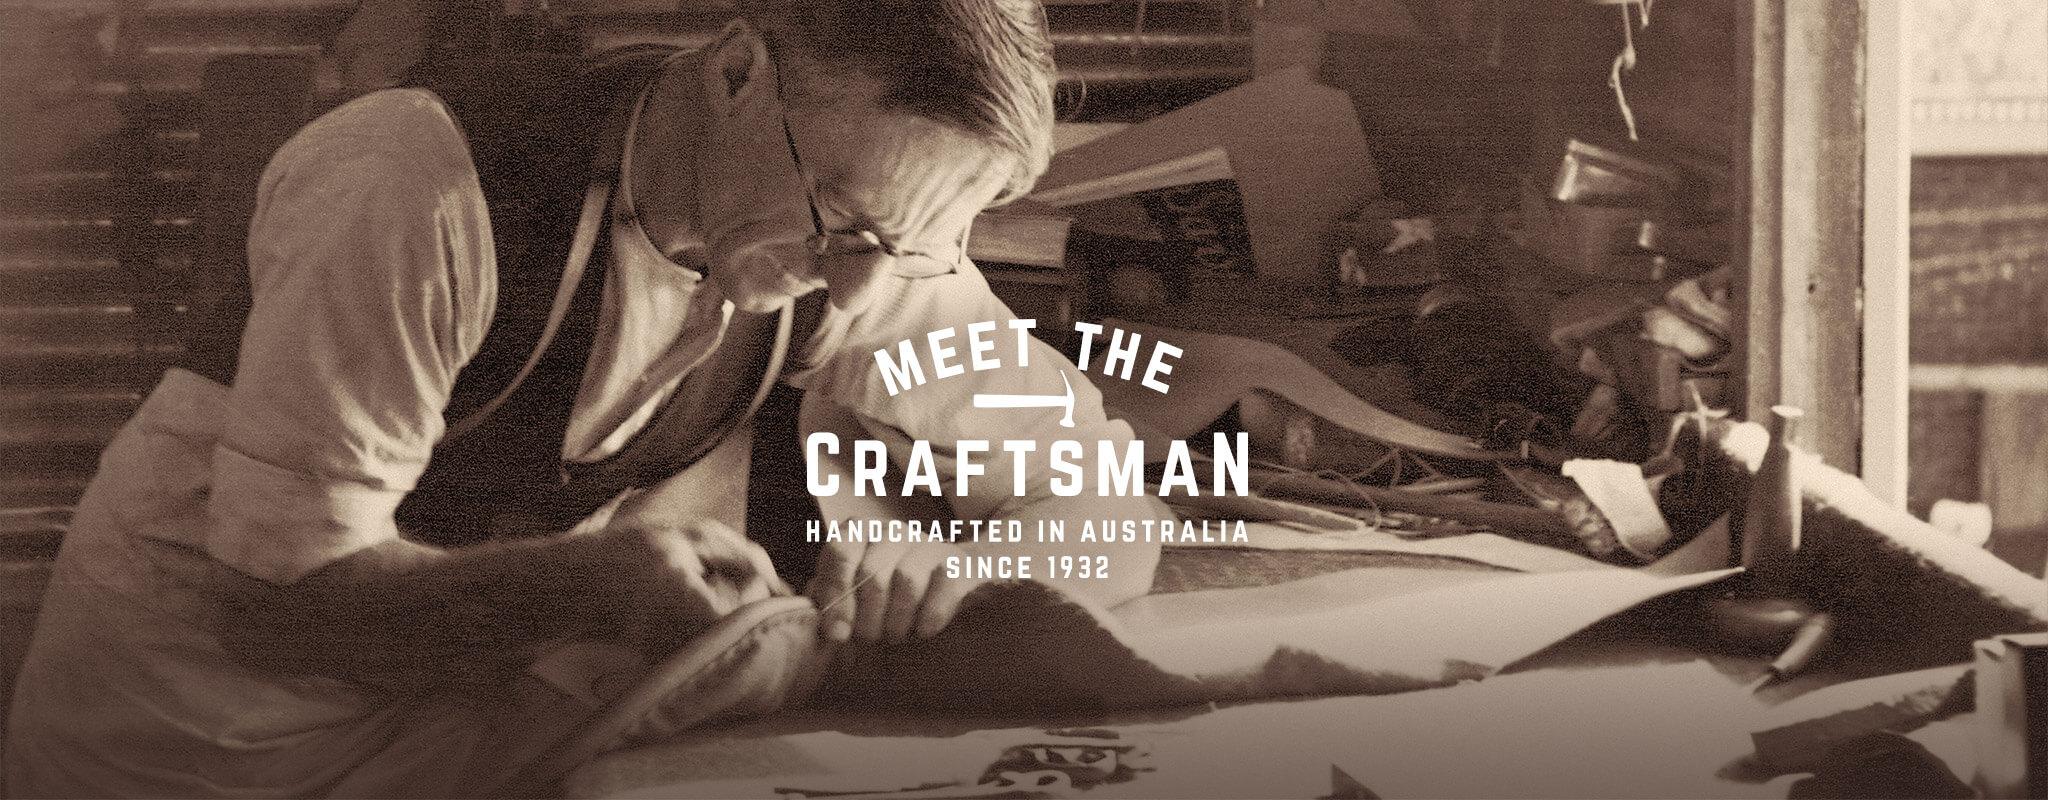 Meet the Craftsman